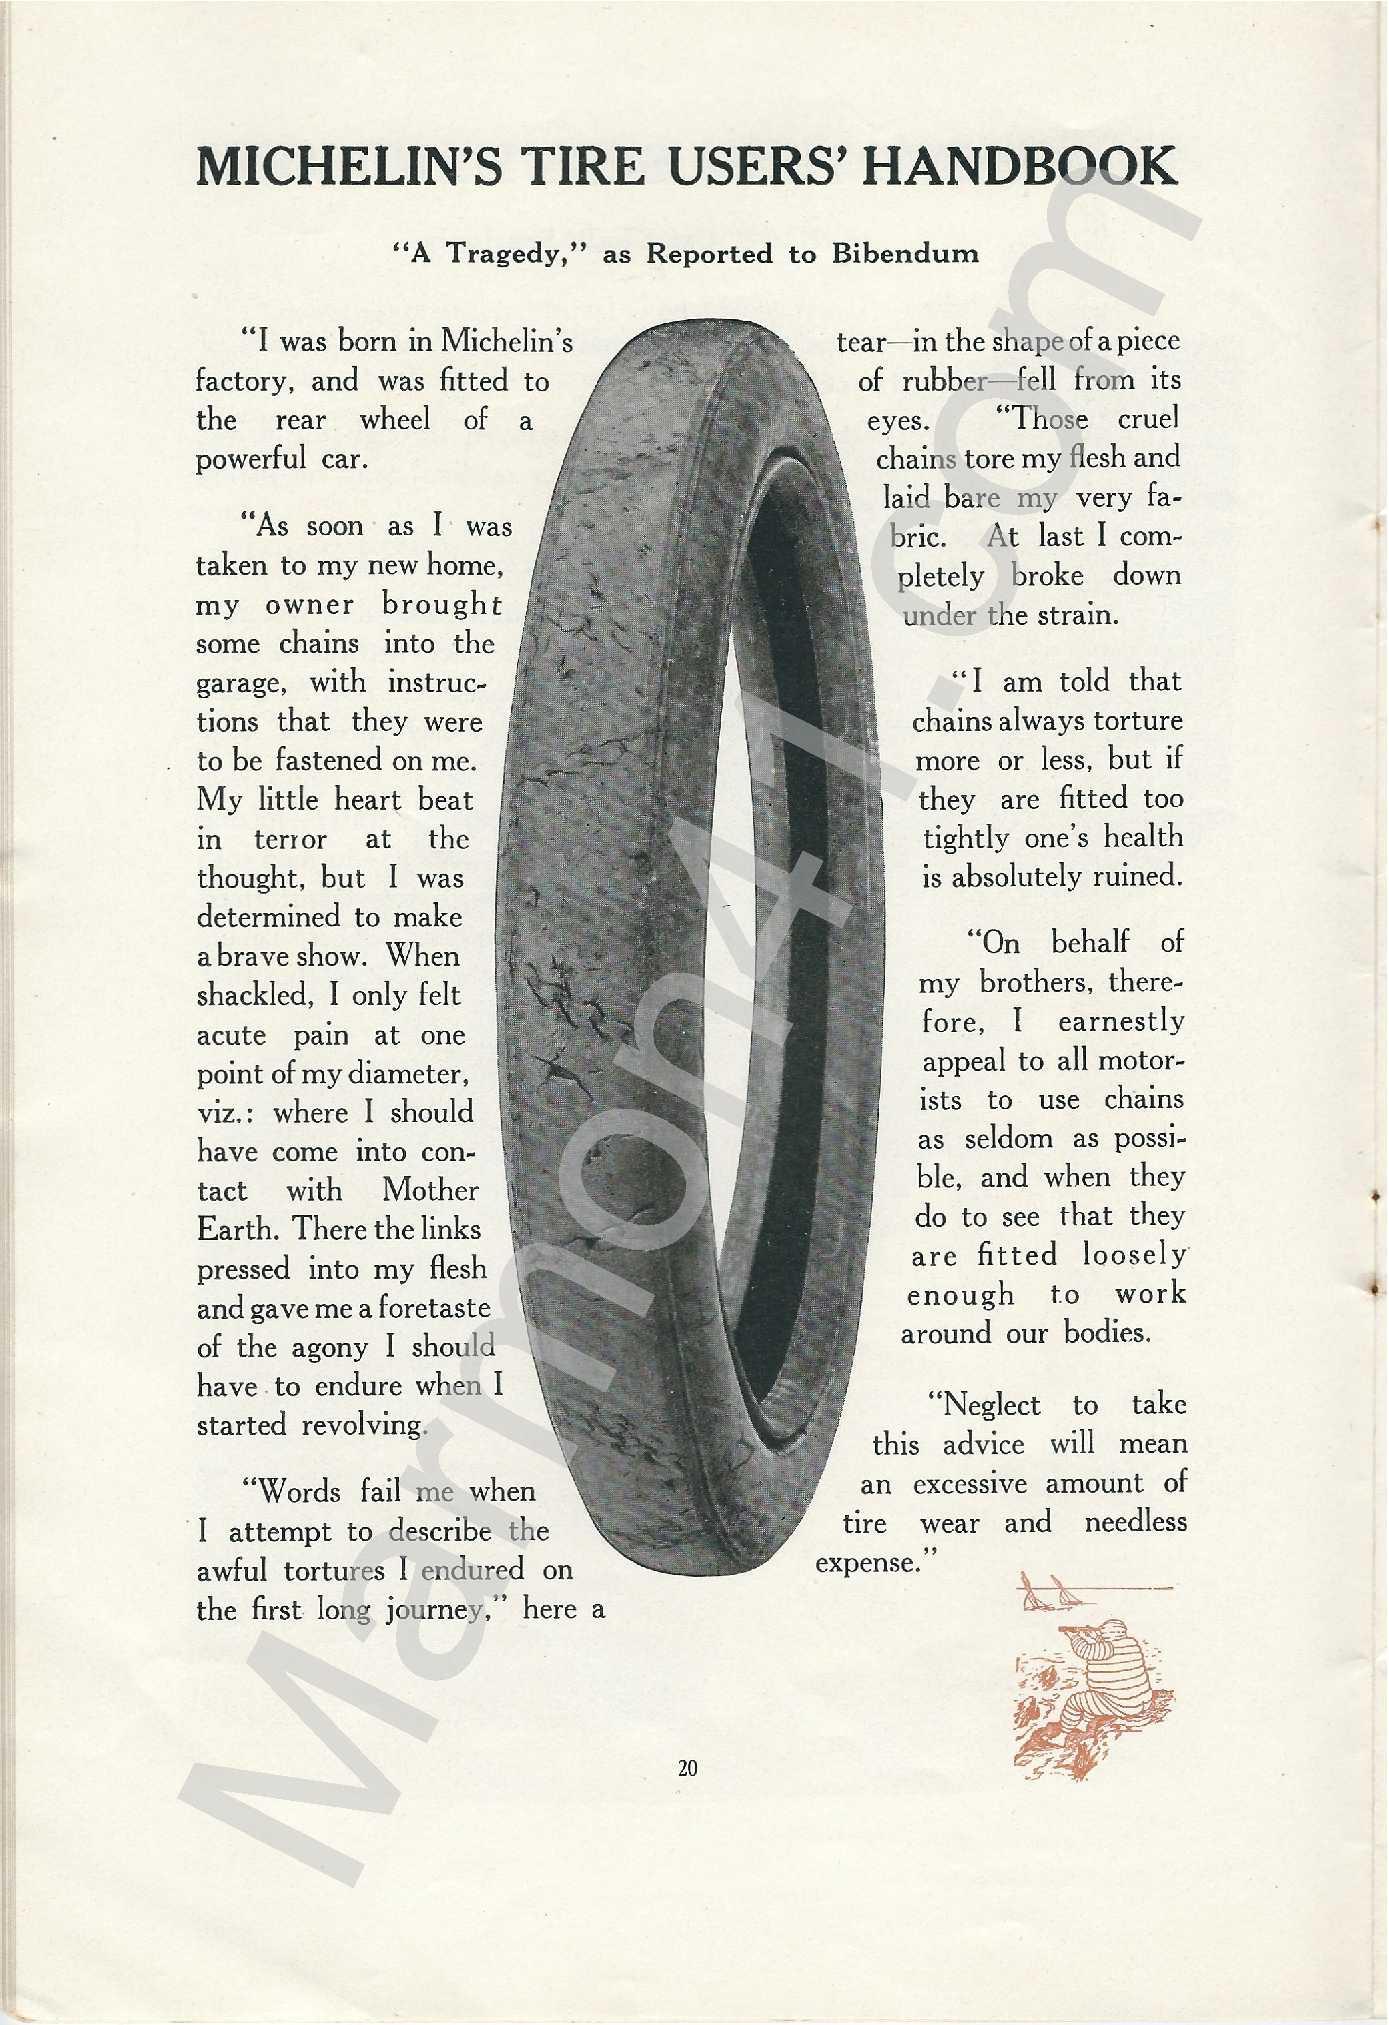 Michelins Tire Users Handbook_21